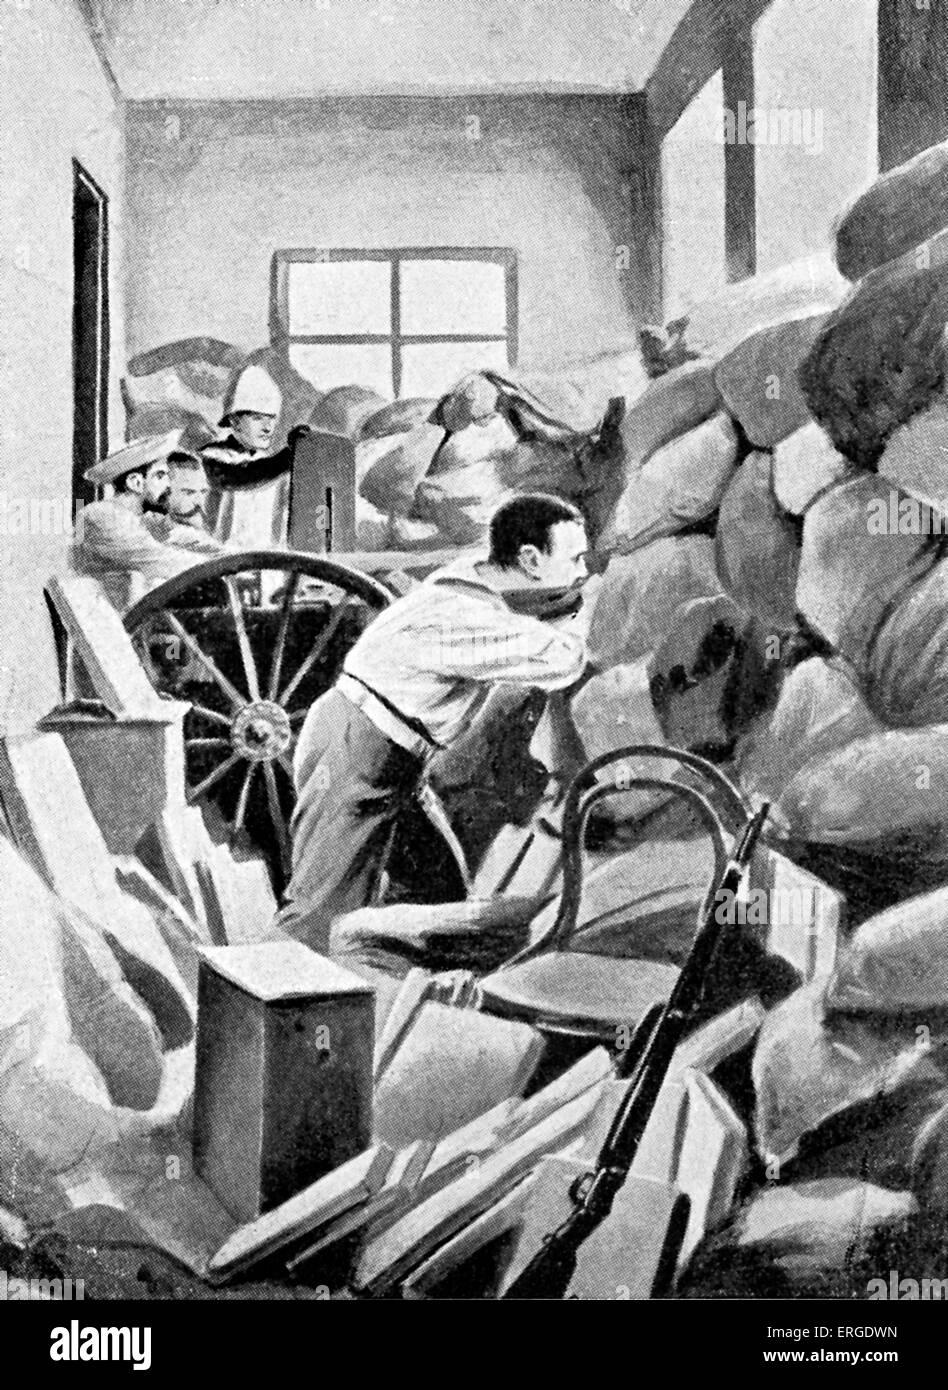 Boxer Rebellion in Peking - British Marine 's Nordenfeldt gun being used against the Boxers on balcony in British - Stock Image